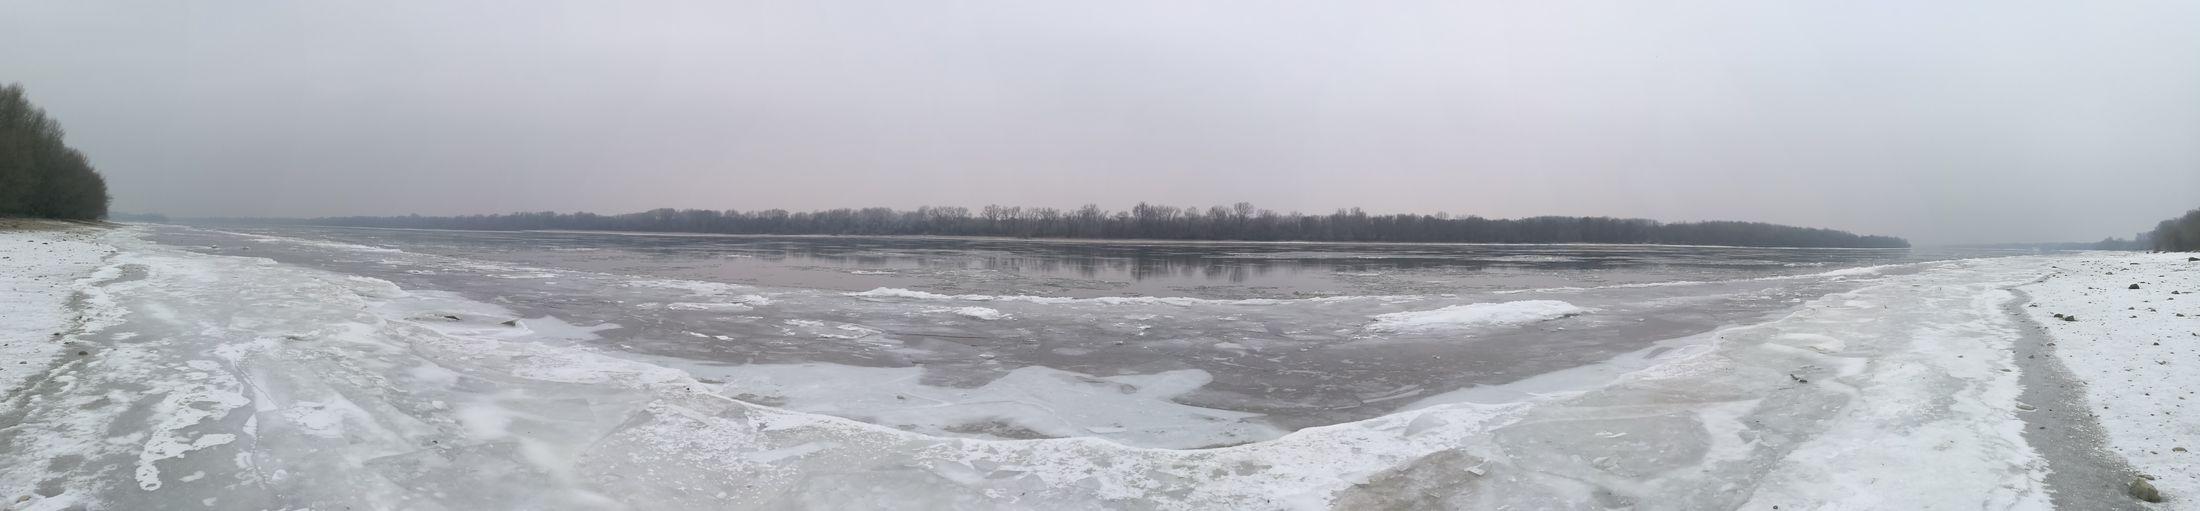 Duna Winter Snow